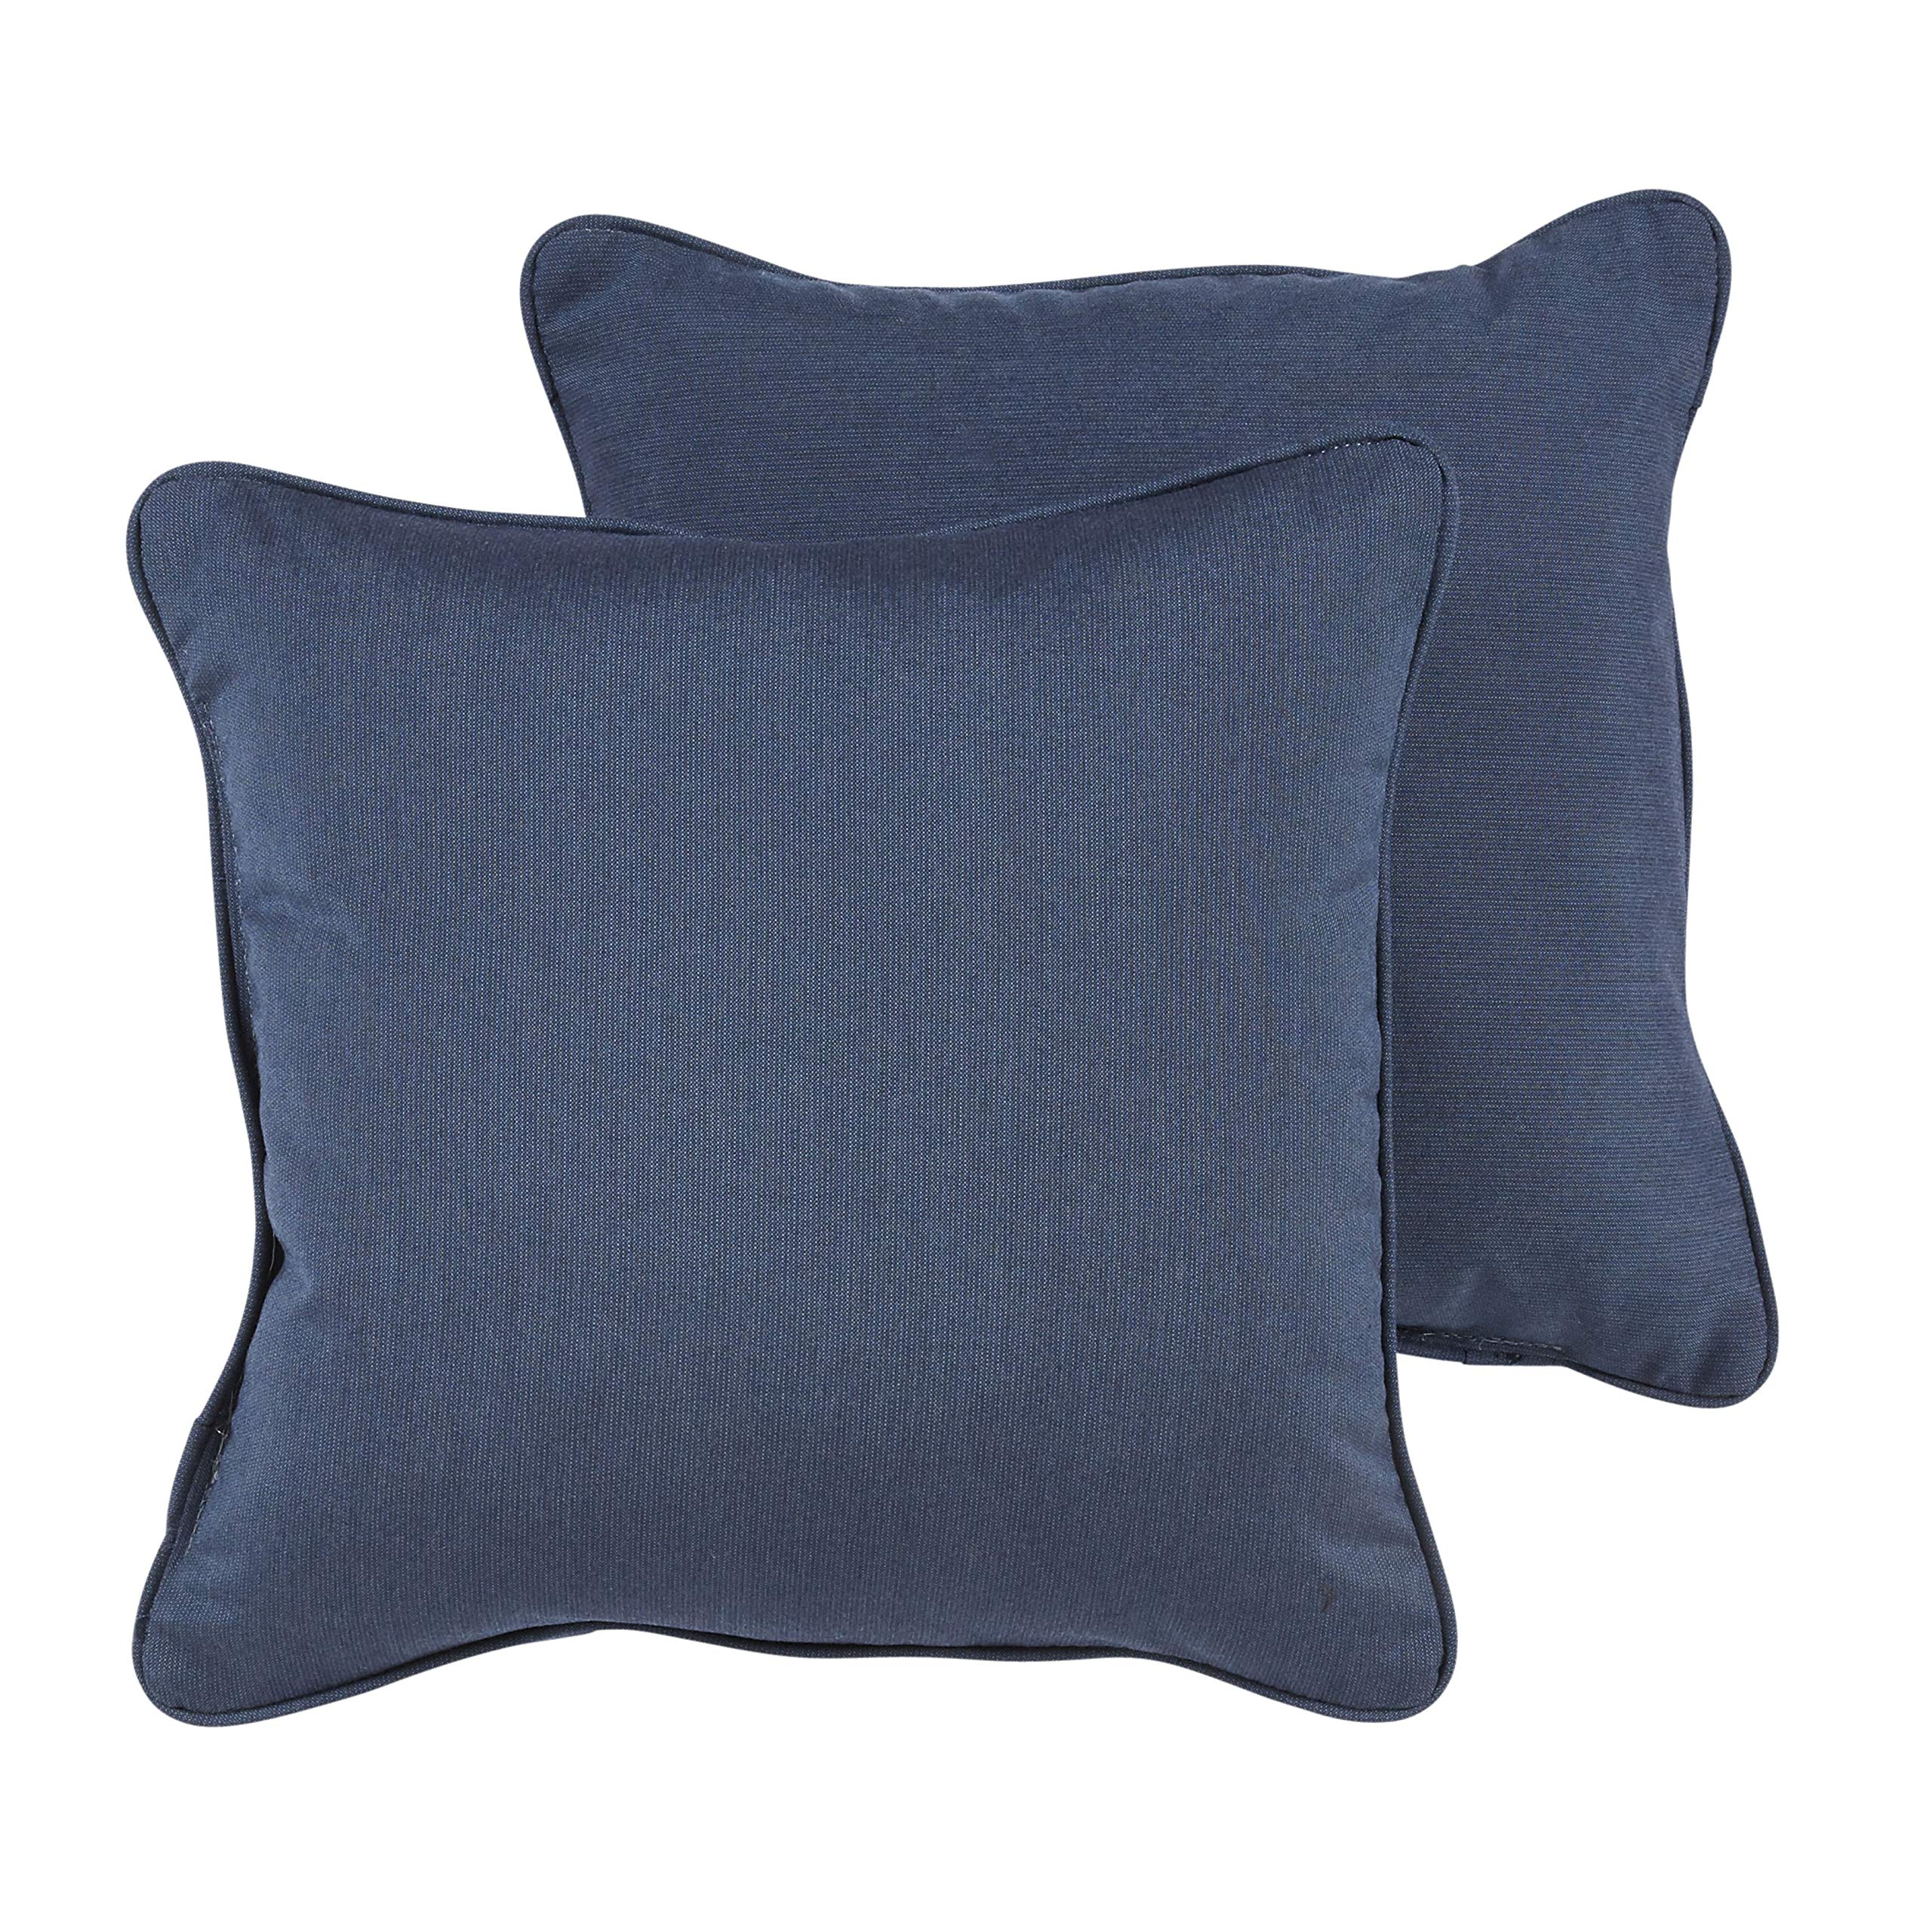 Humble and Haute Callahan Sunbrella Indigo Indoor/Outdoor 18 Inch Corded Pillow Set